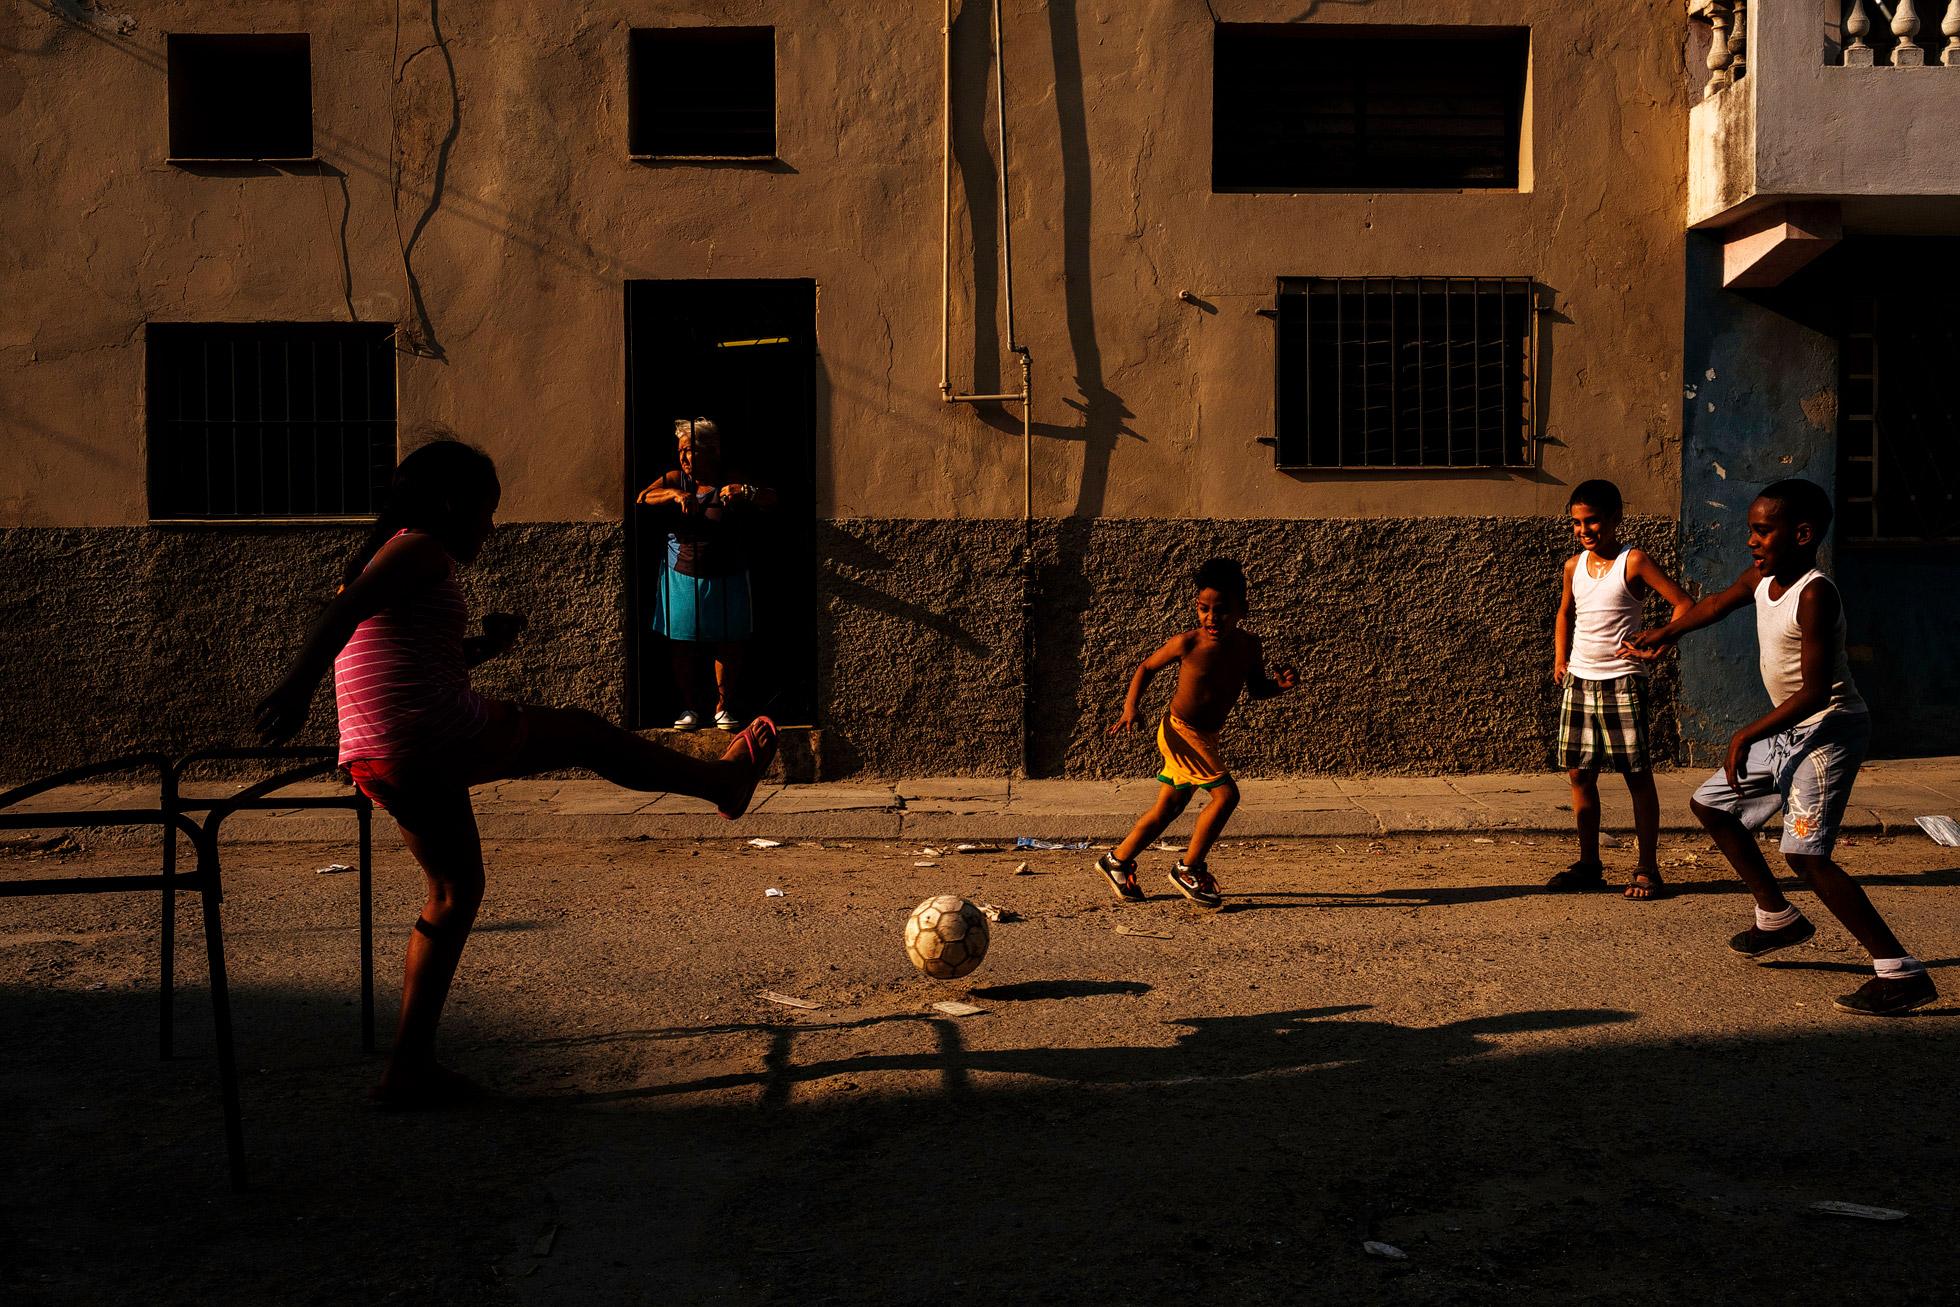 Cuba Street Photographer